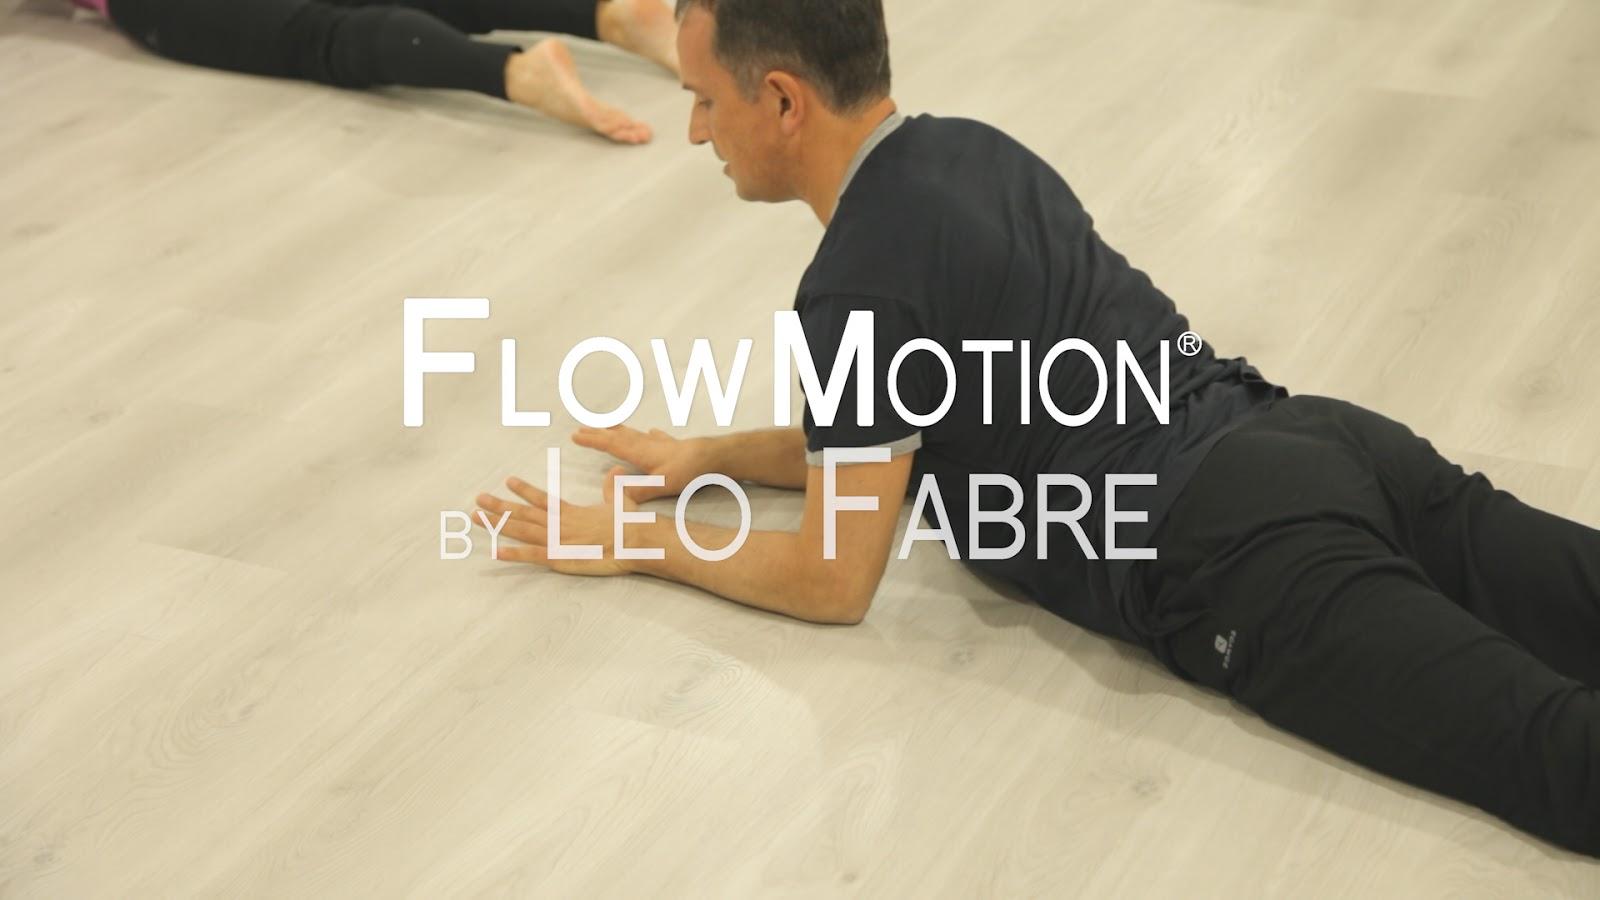 FlowMotion con Leo Fabre